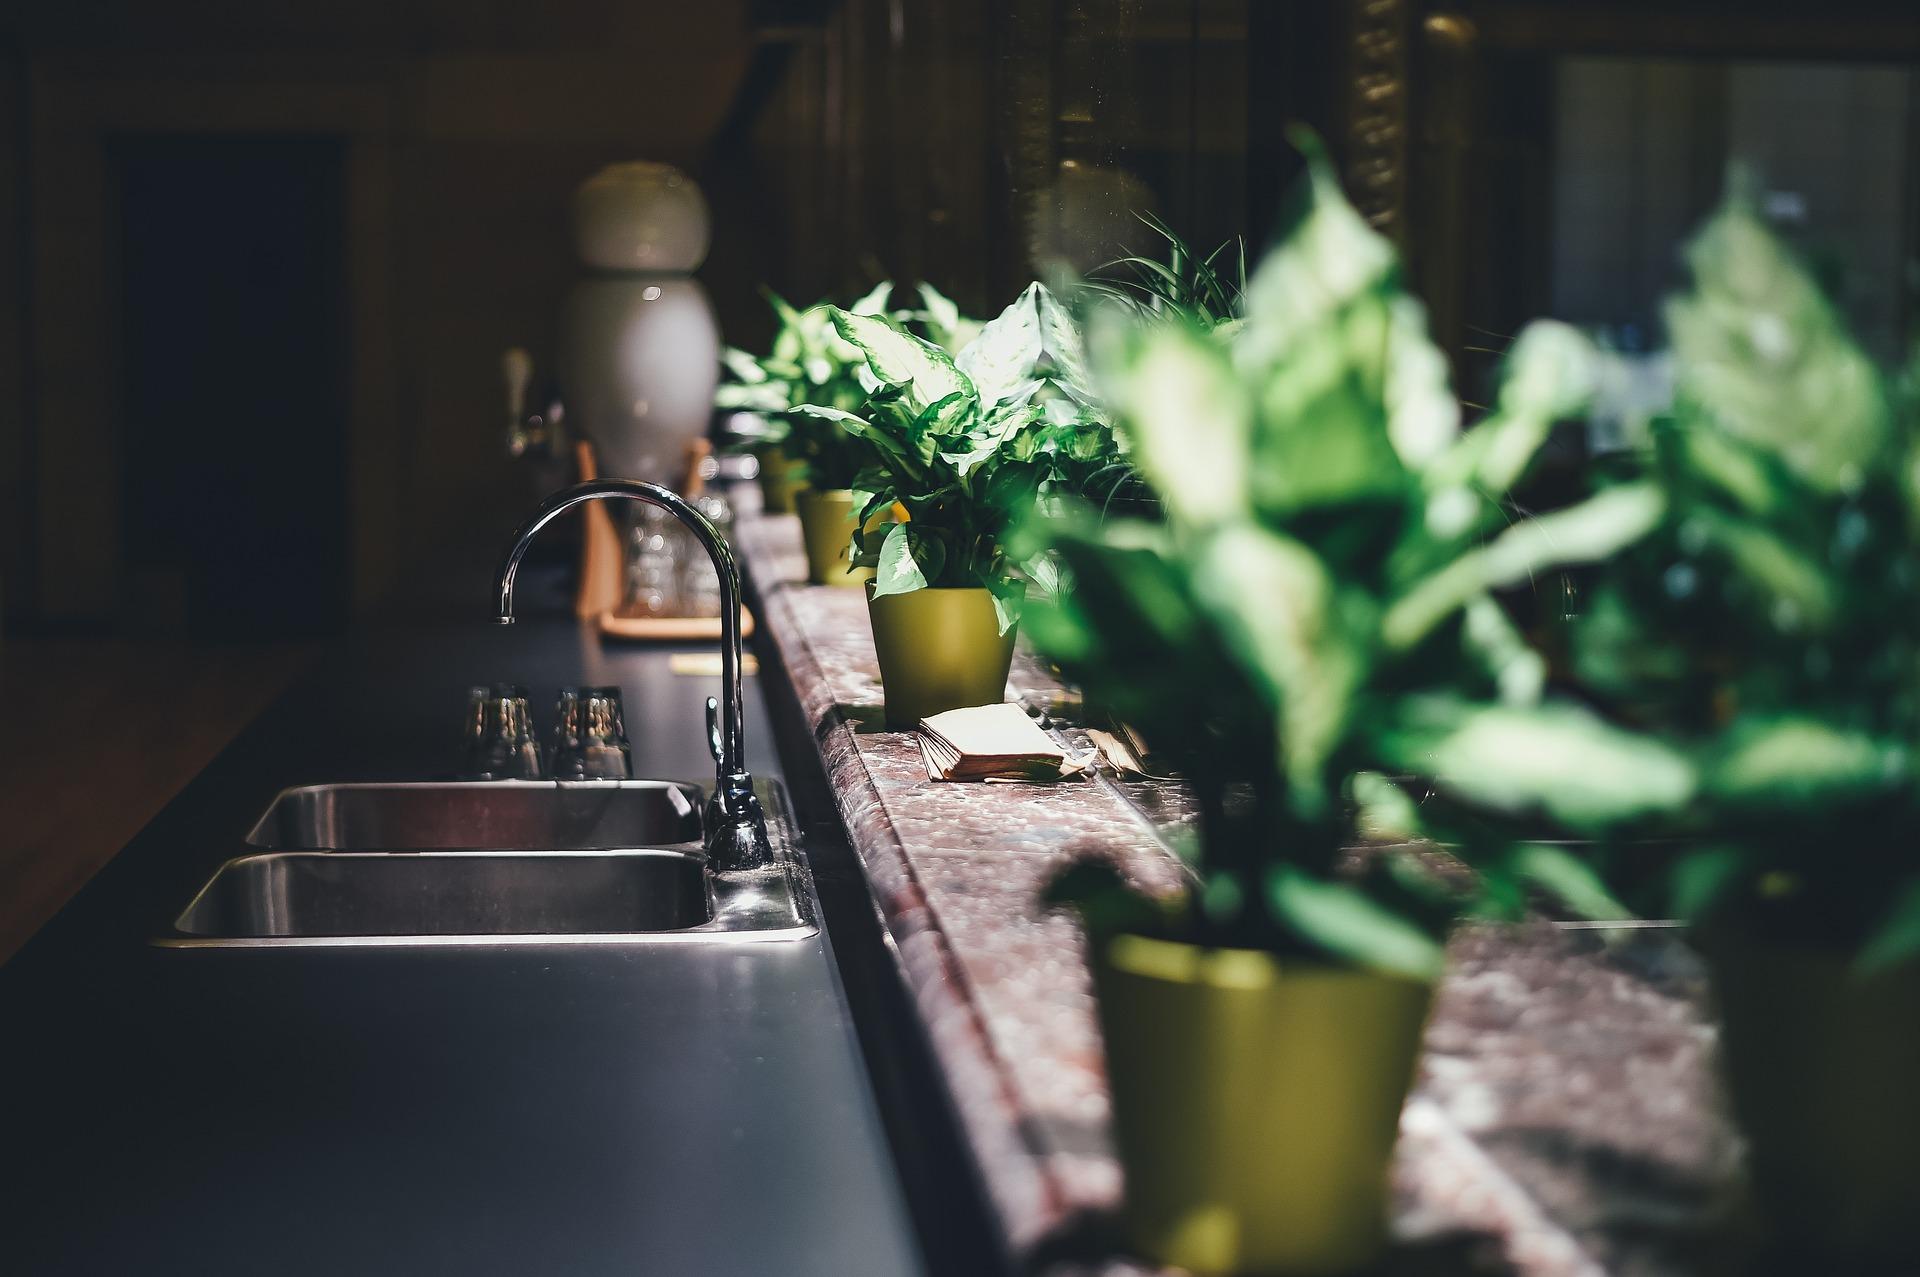 Kuchnia to centralne miejsce każdego mieszkania lub domu